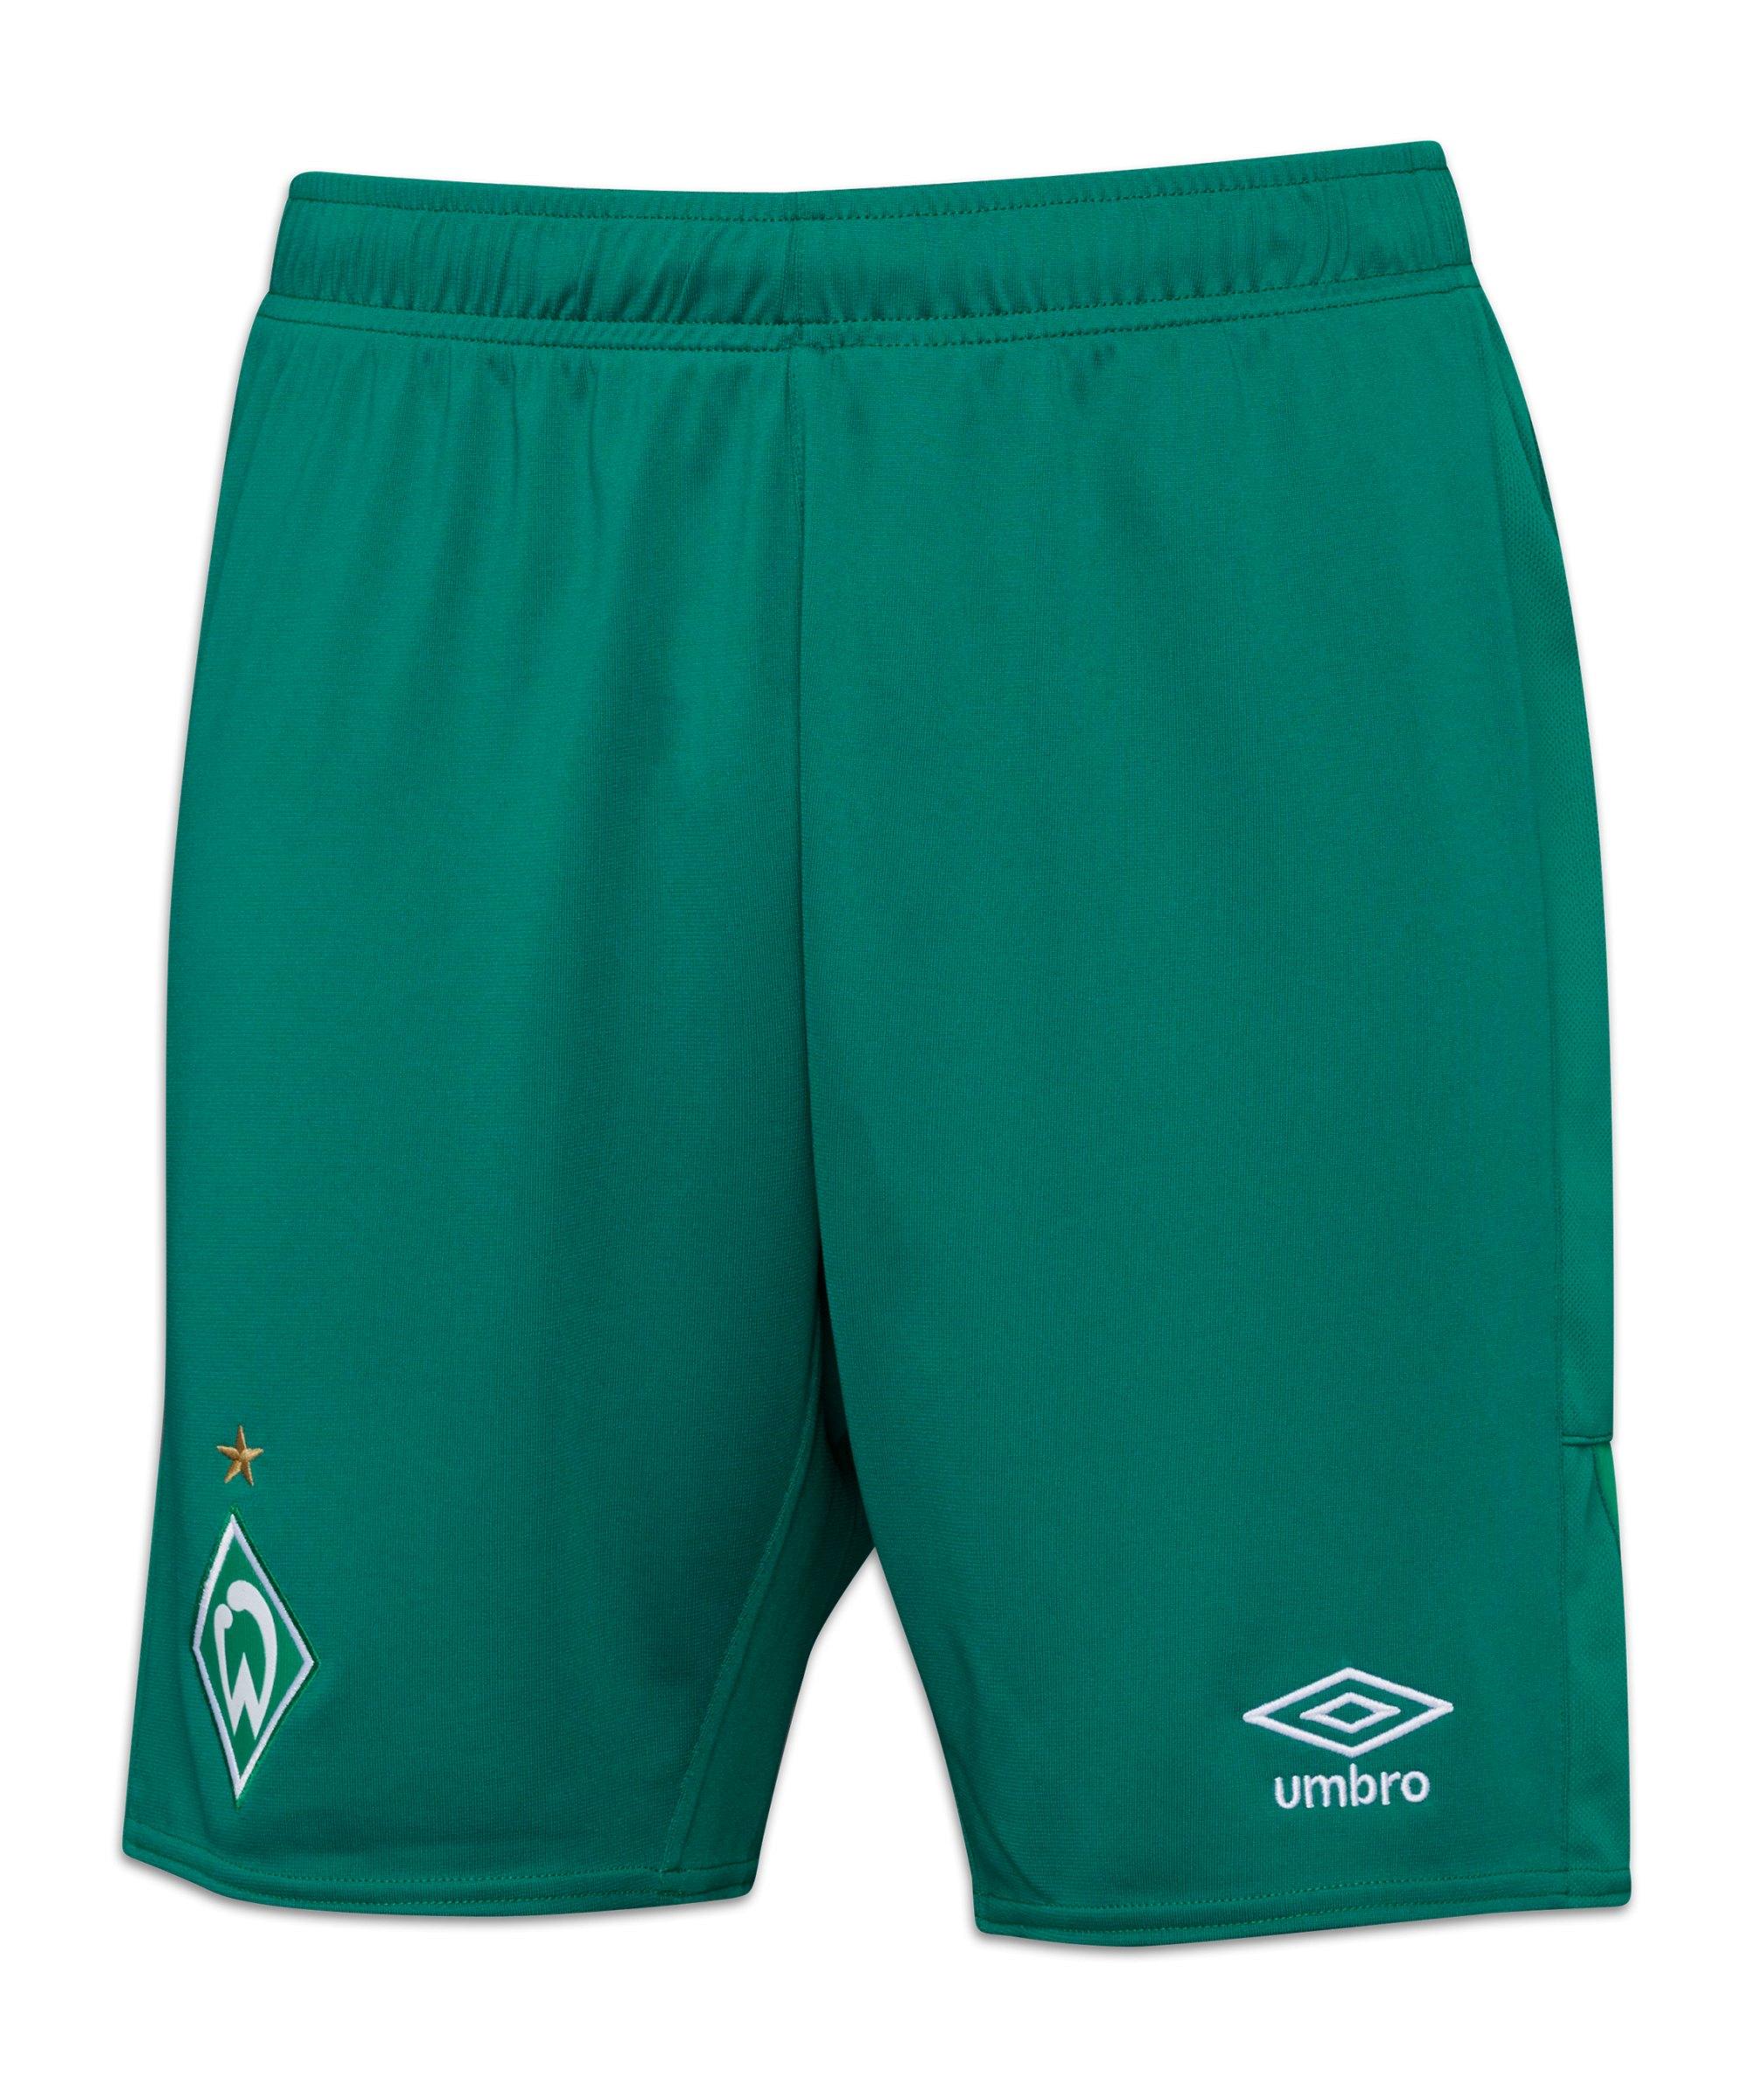 Umbro SV Werder Bremen Short Away 2021/2022 Grün - gruen